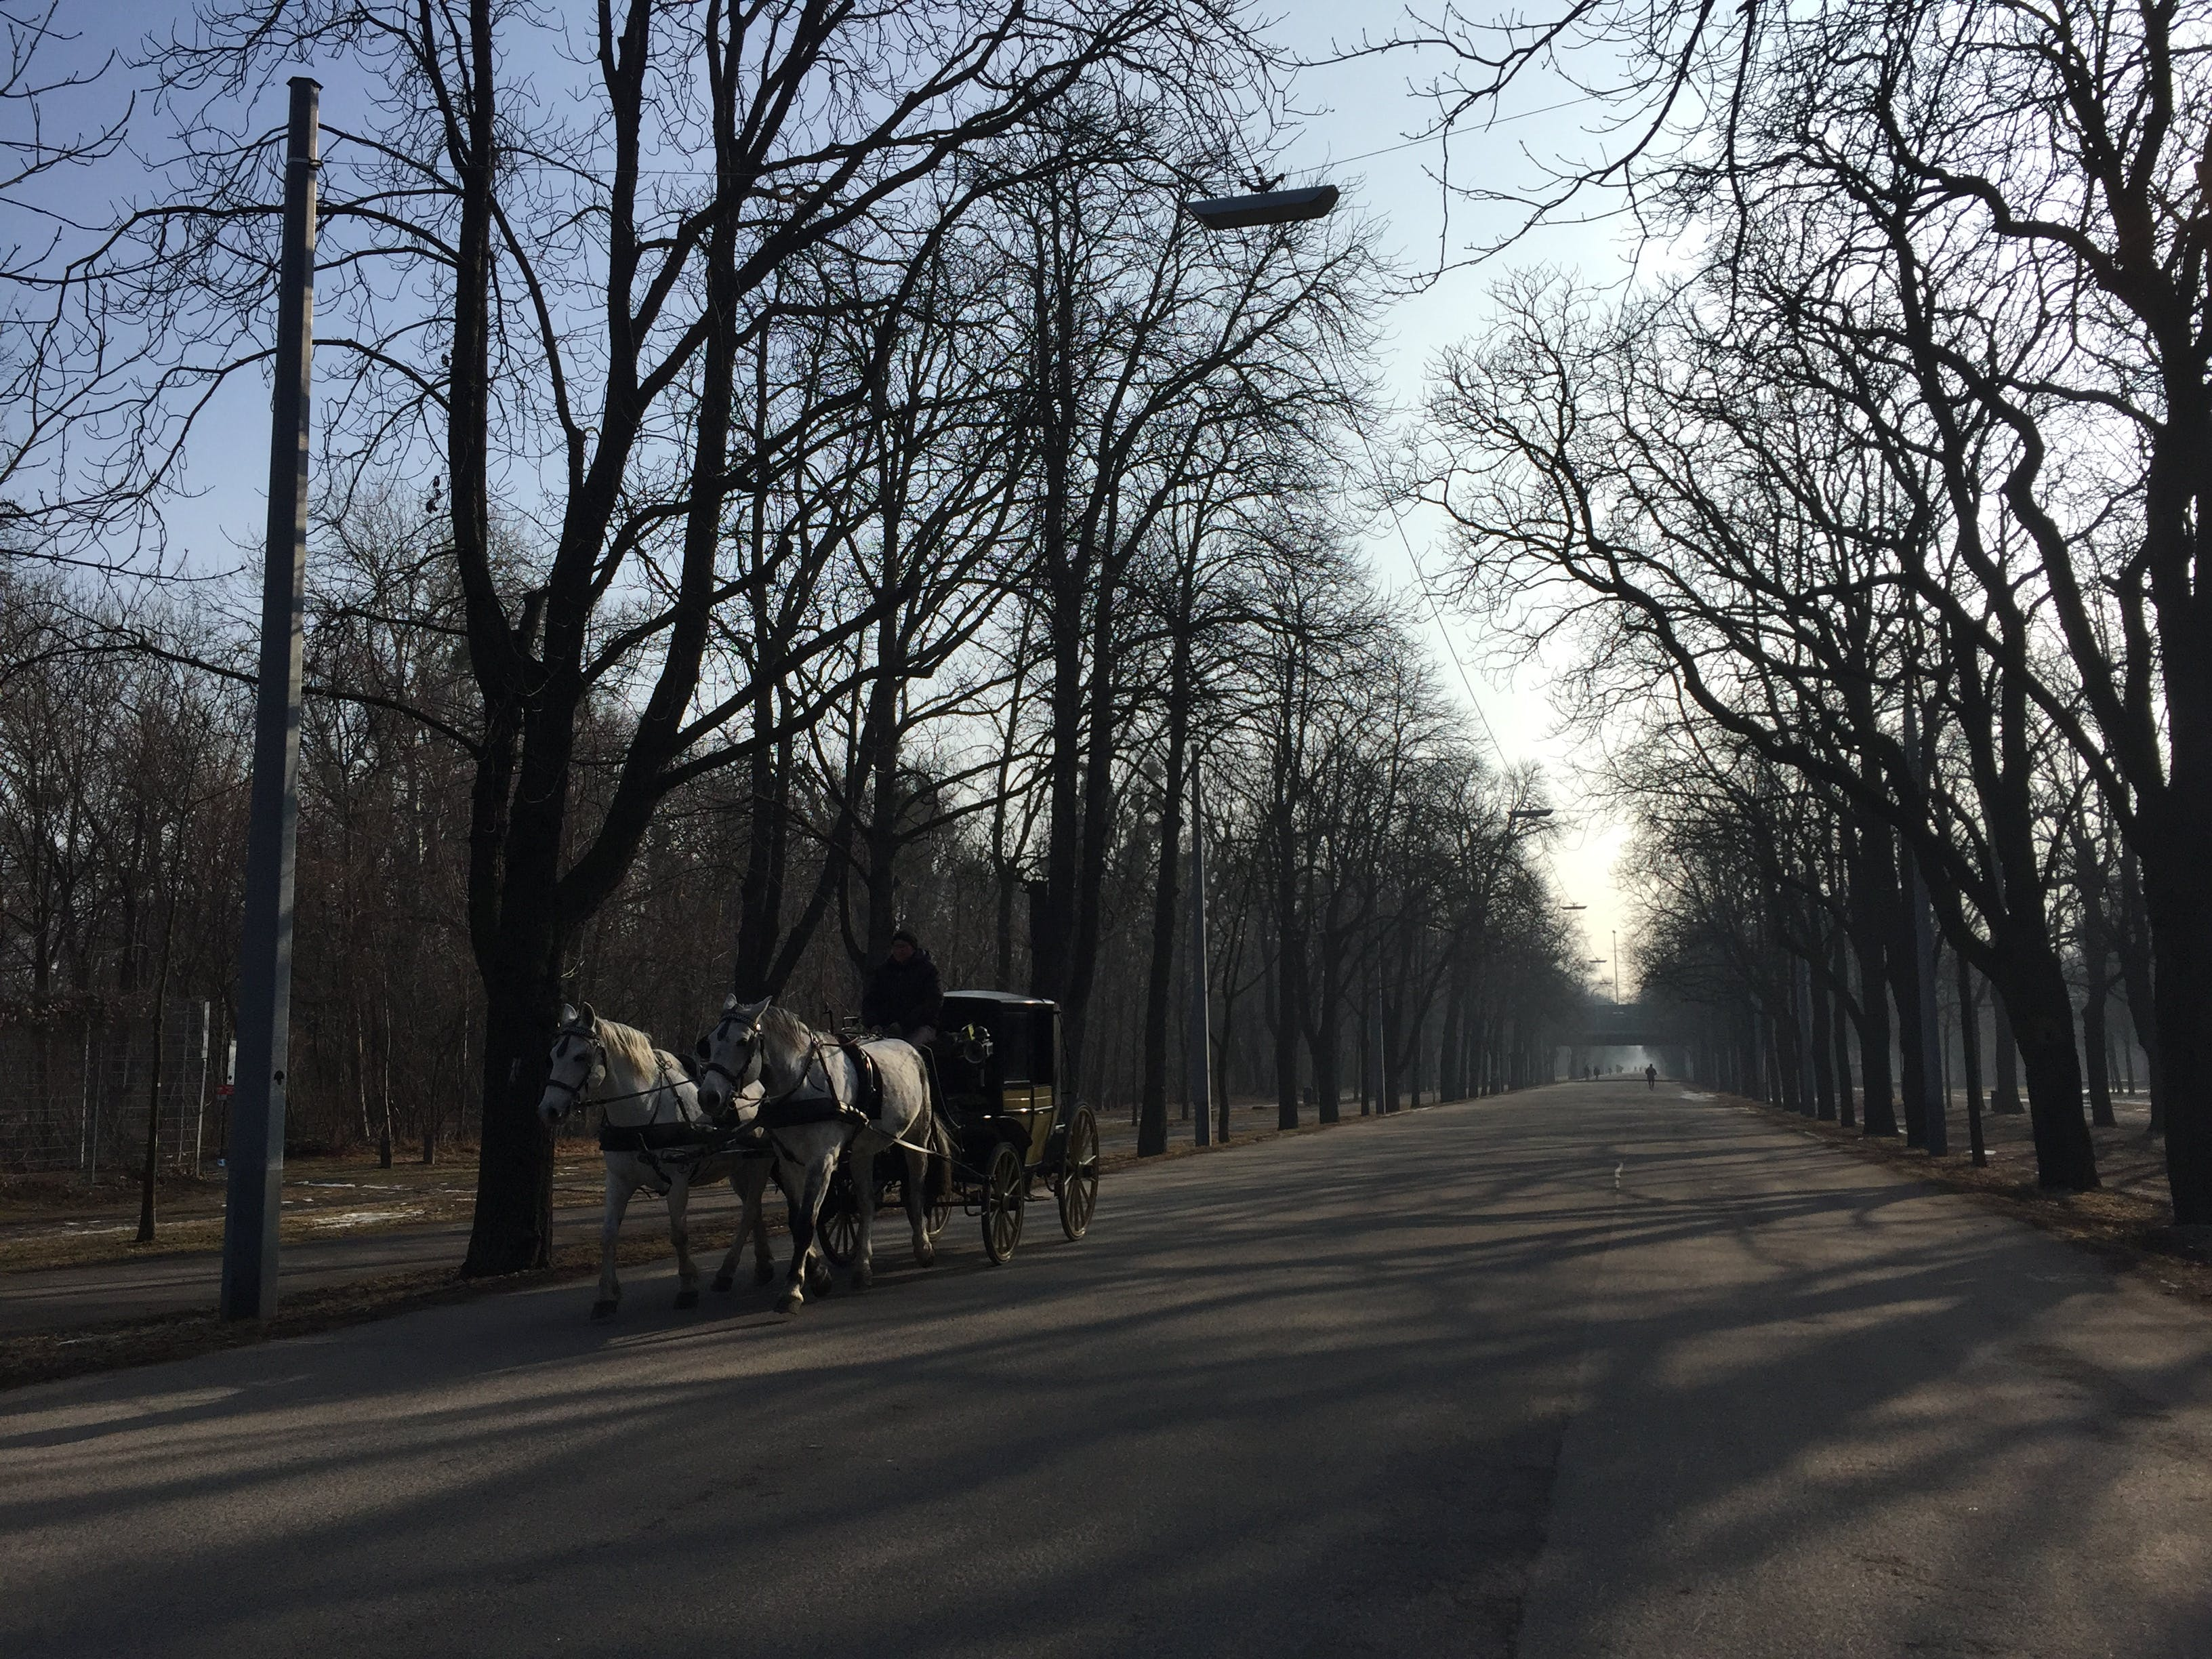 Free stock photo of alley, city park, horses, morning